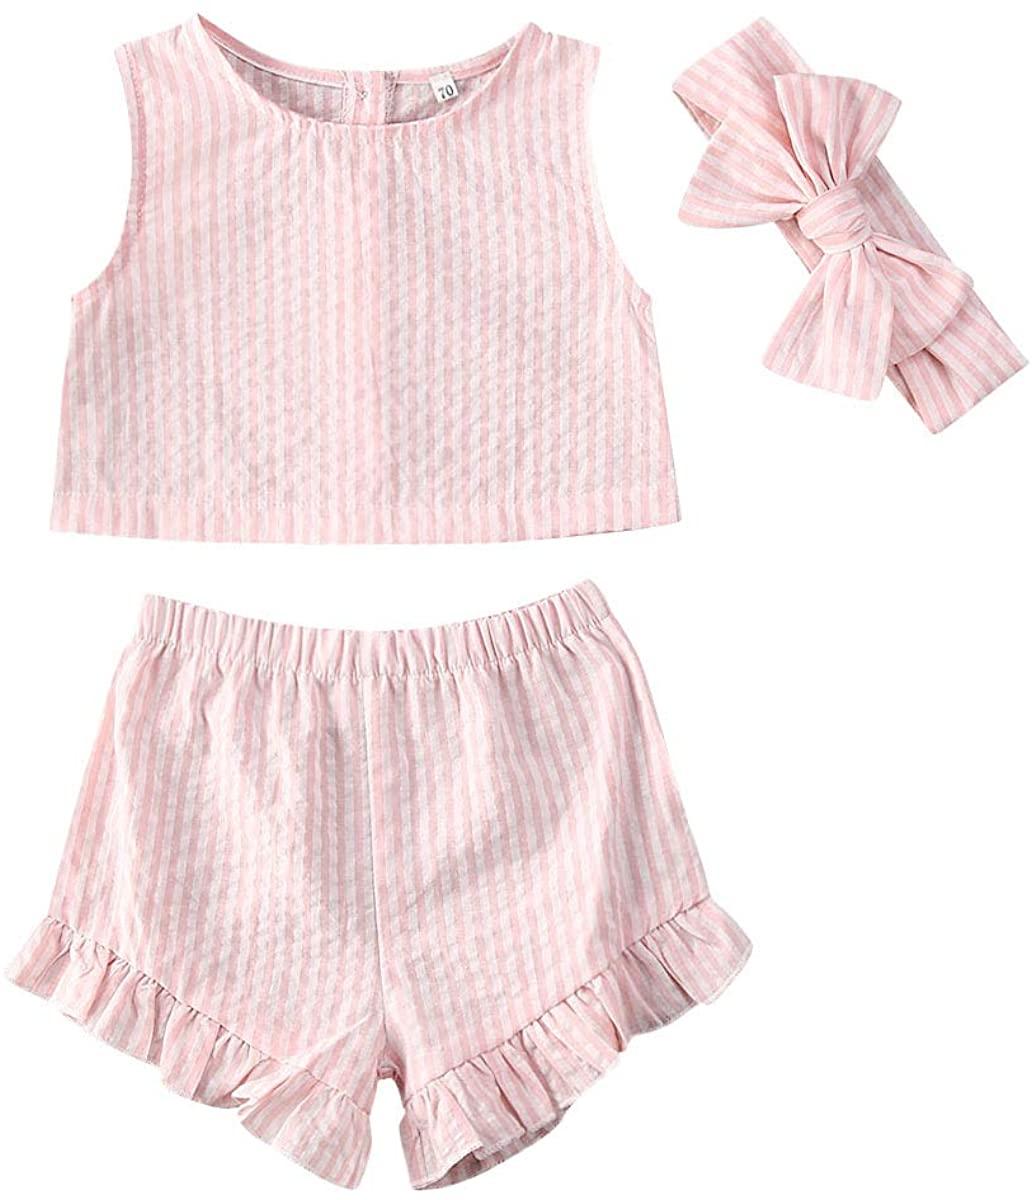 Marksmile Summer Newbrn Toddler Baby Girls Striped Sleeveless Top + Short Ruffle Elastic Band Pants+ Bow Hair Band